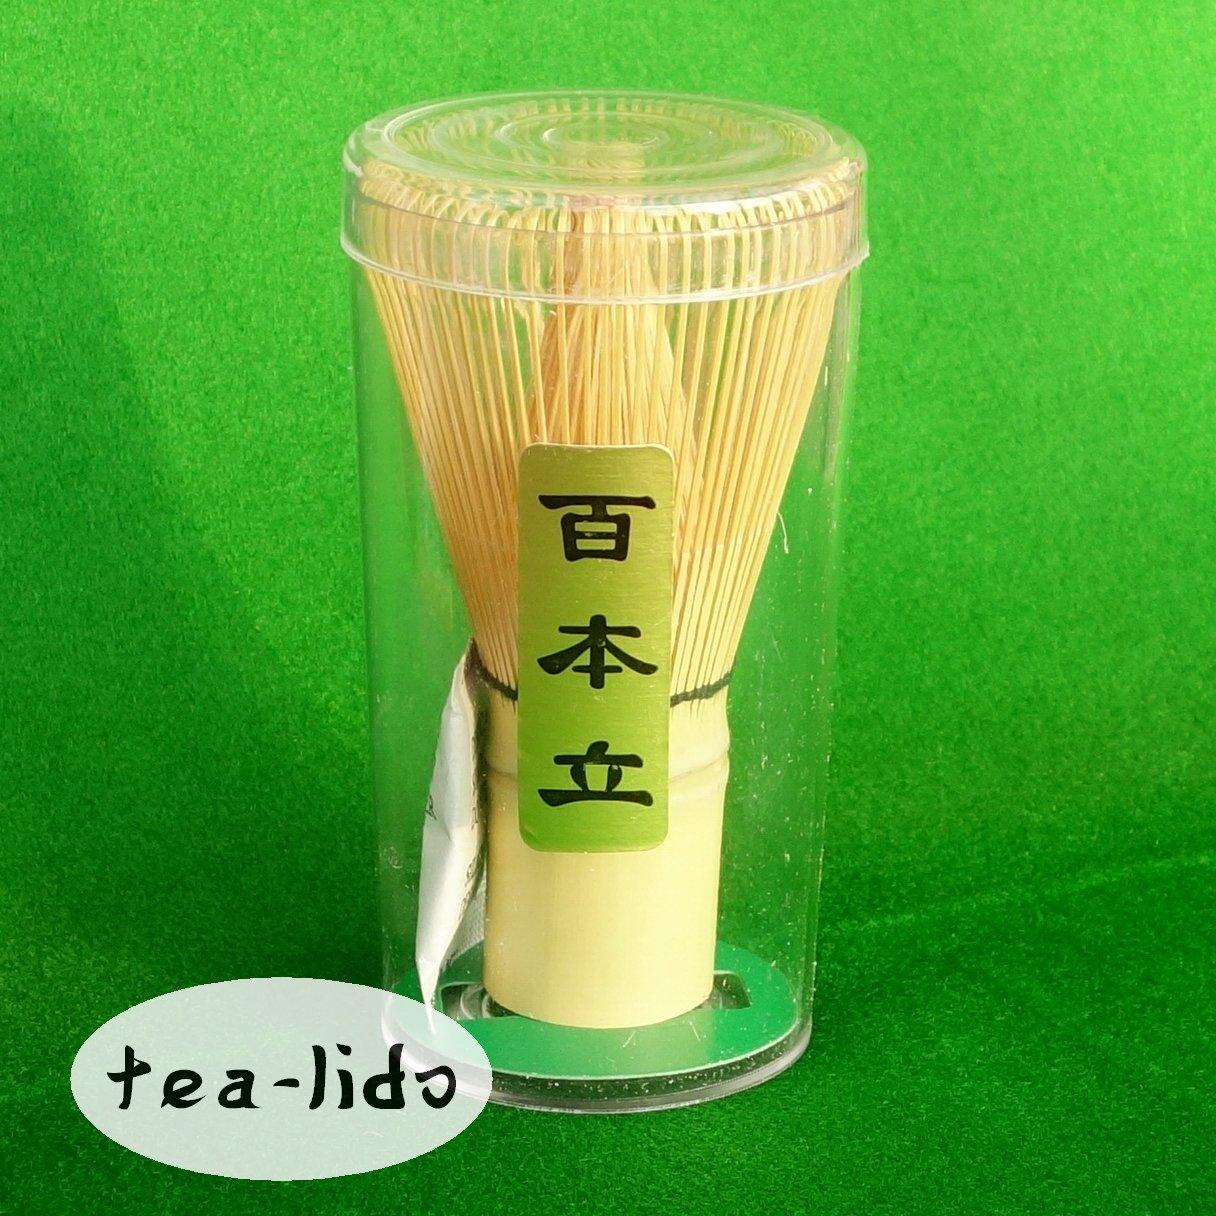 Bamboo Matcha Whisk, 100 Prong. For Matcha Green Tea Powder. Ceremony, Ceremonial, Premium, Handmade